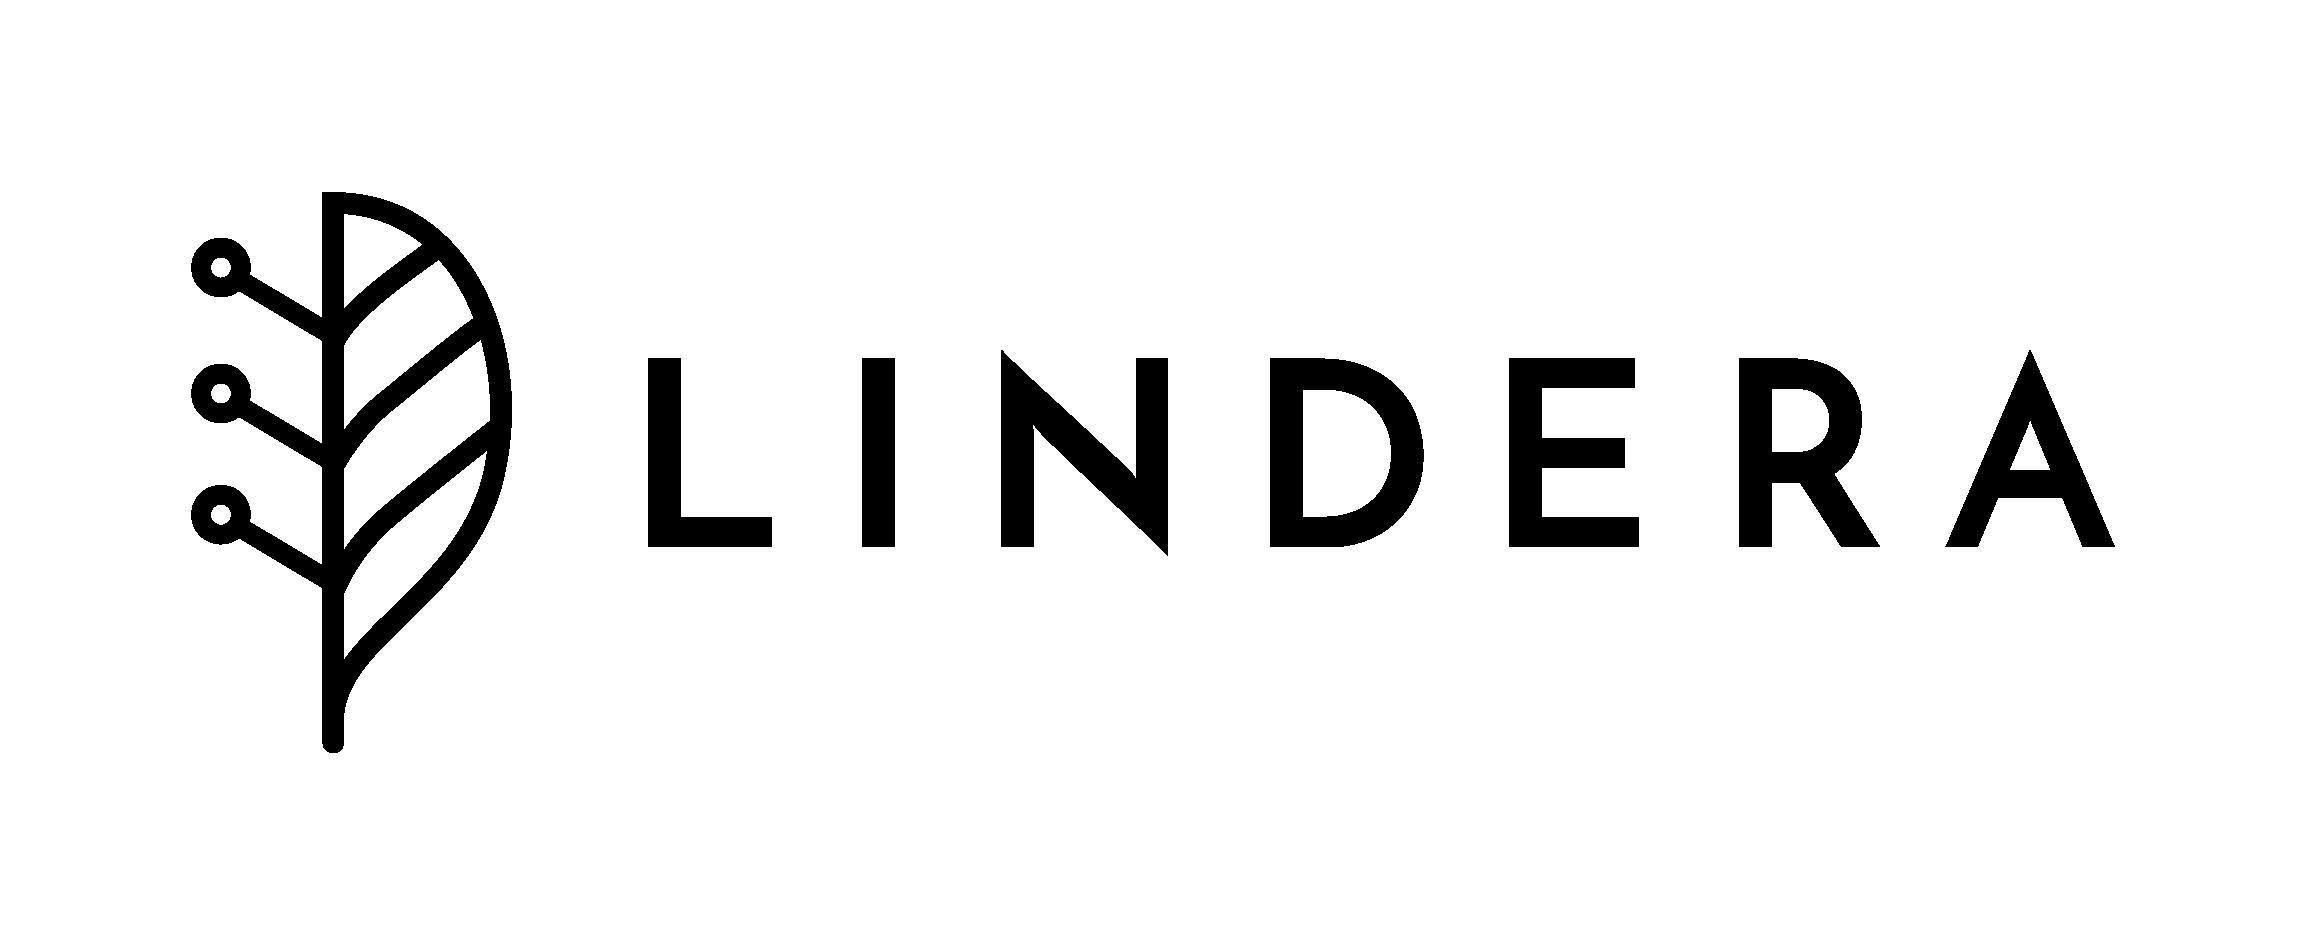 lindera_wortbildmarke_schwarz_021